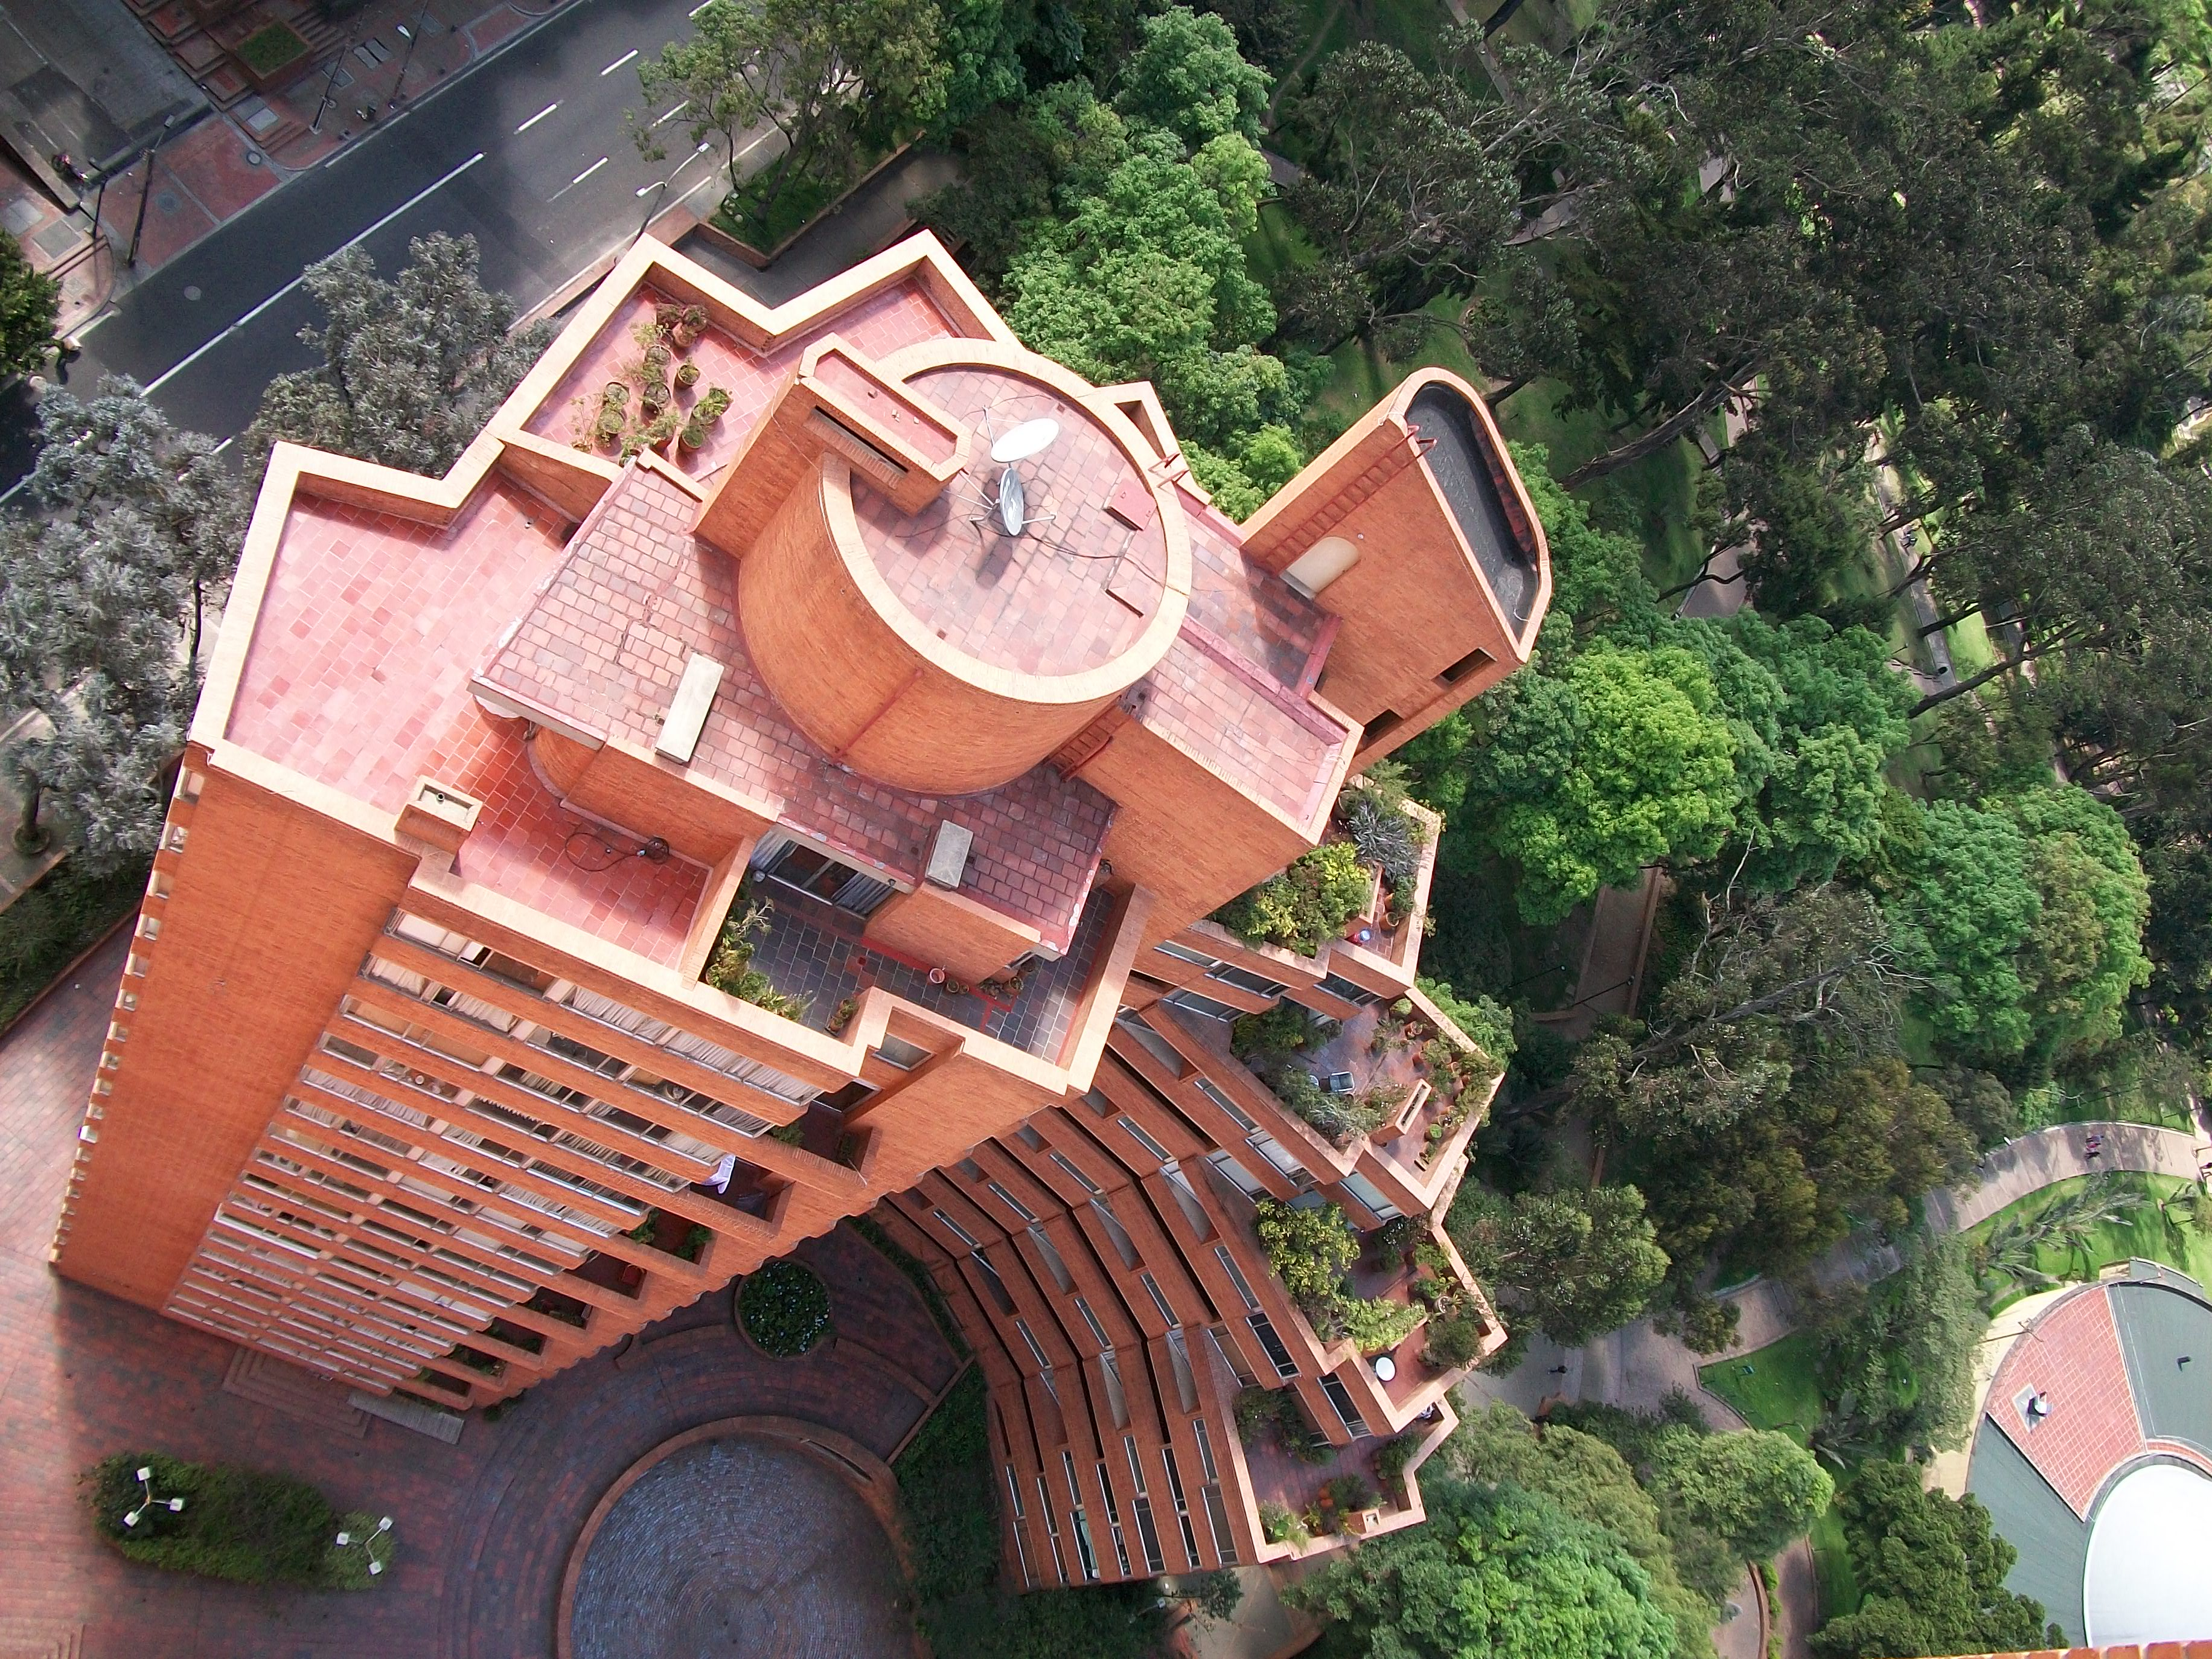 Depiction of Arquitectura de Colombia